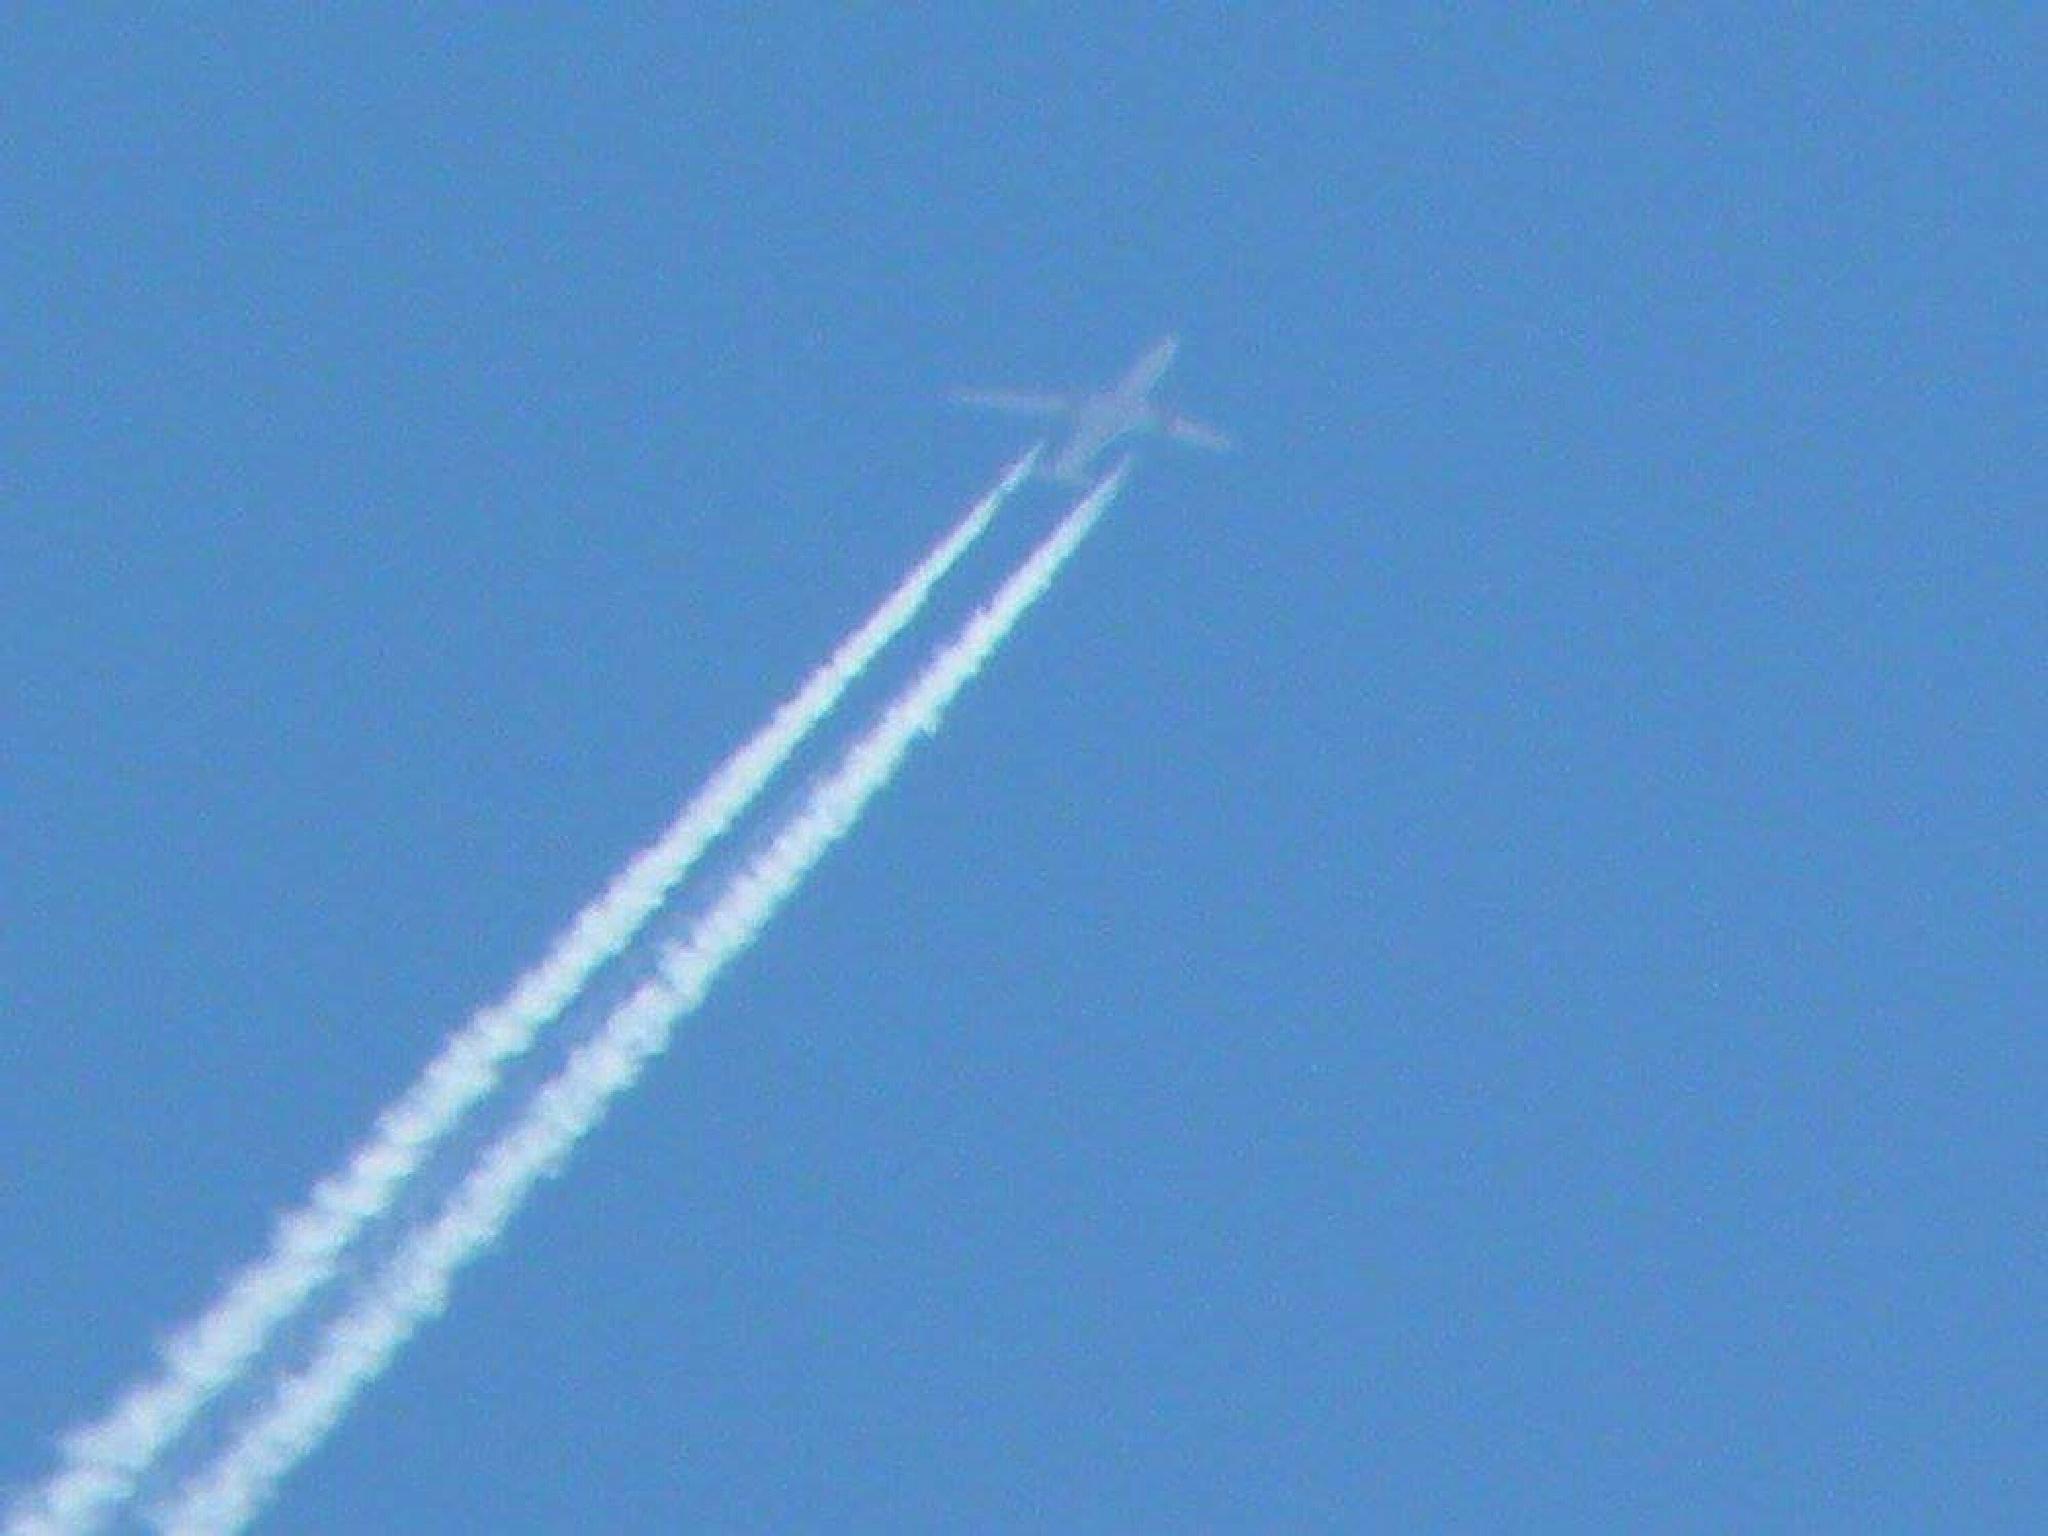 Flying High by Bern